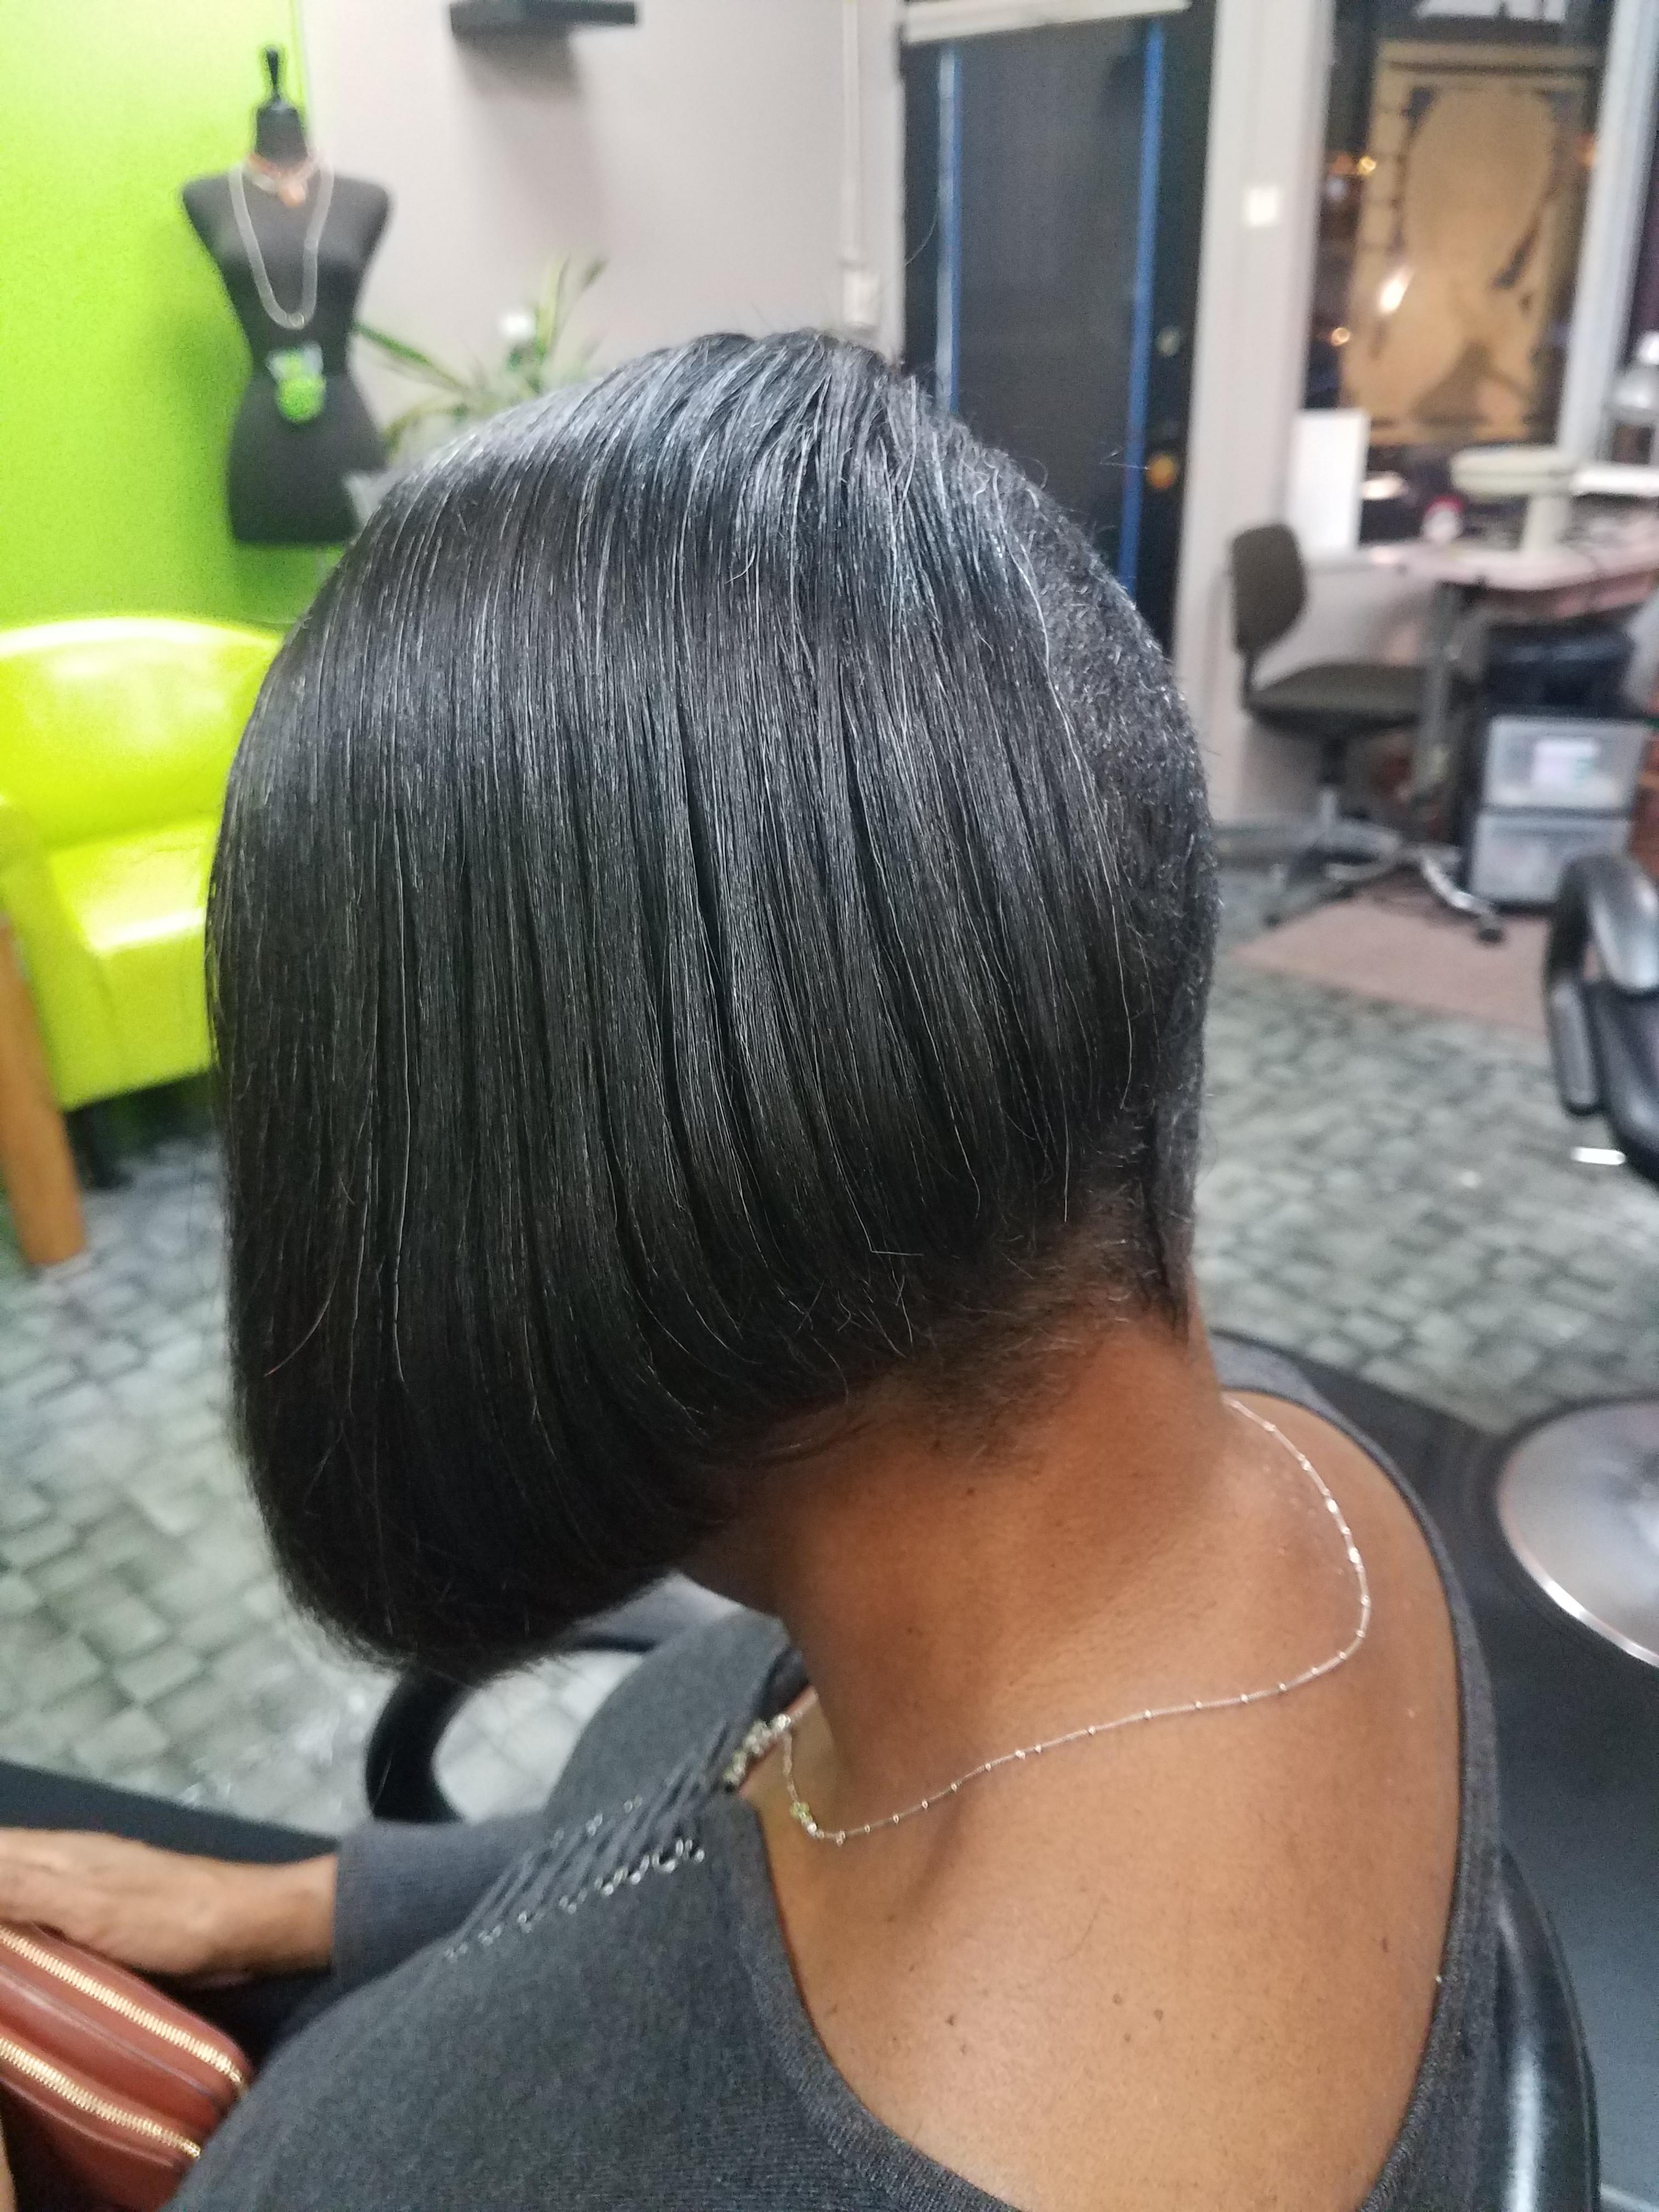 Haircut w/style